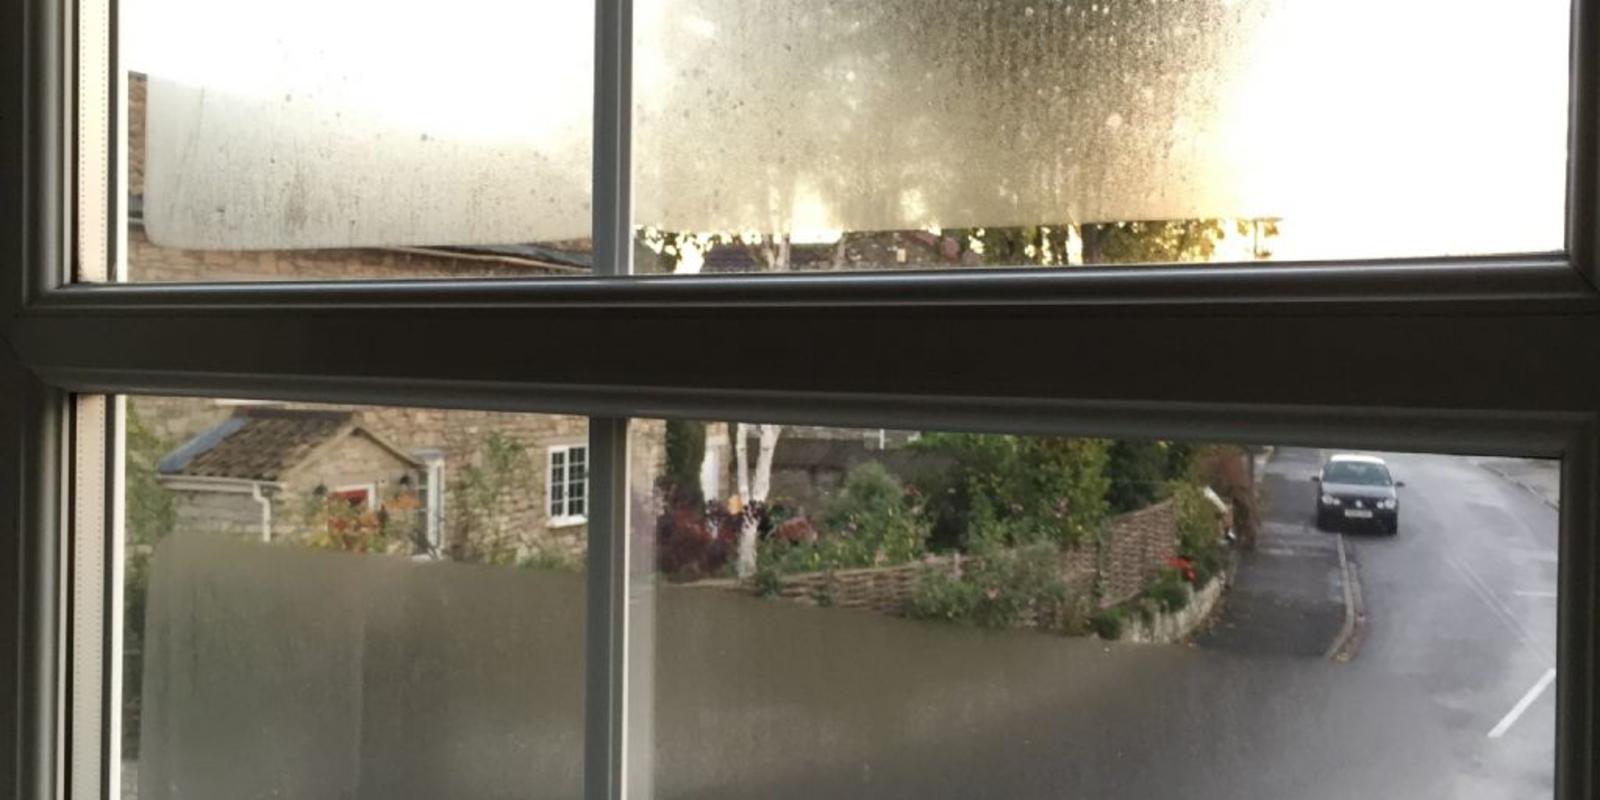 condens binnenkant raam dubbel glas